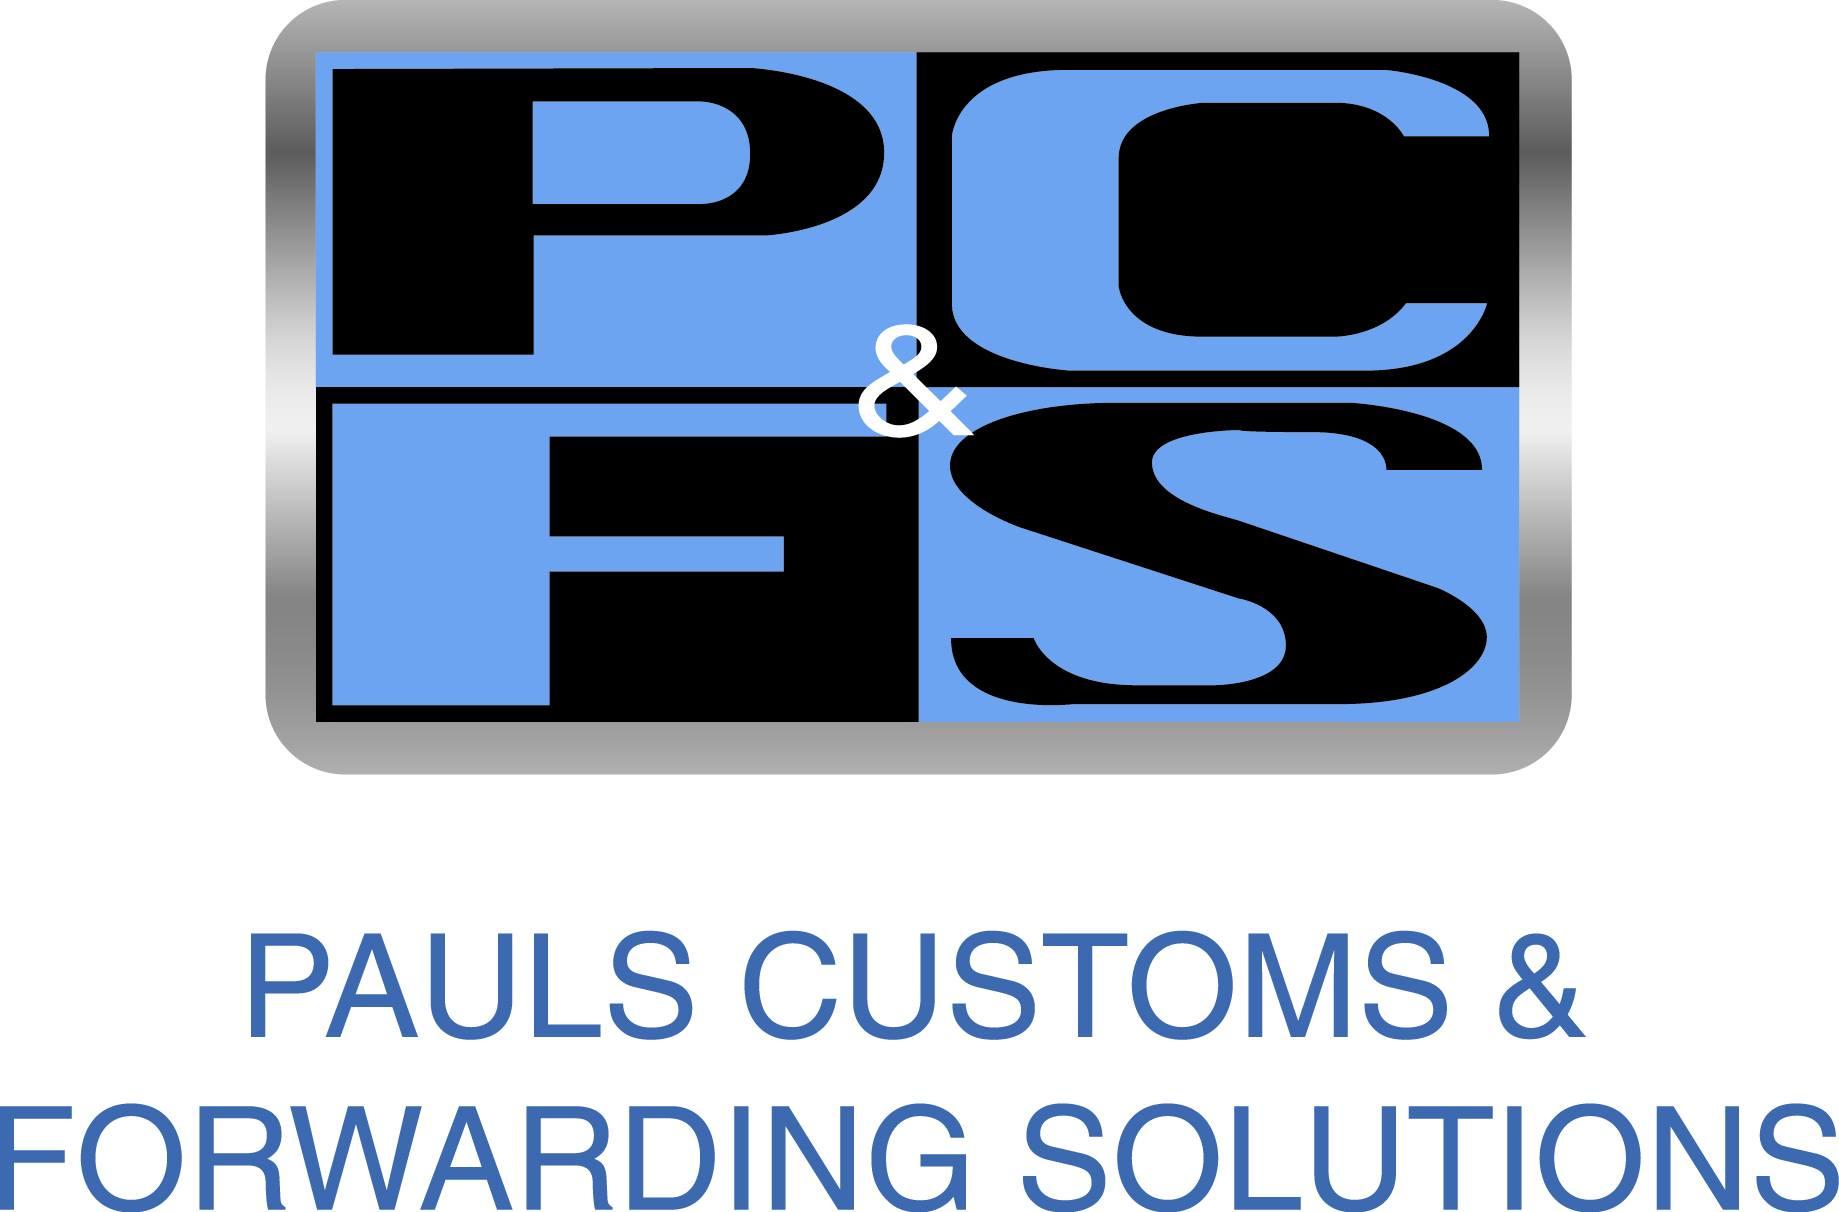 PCFS, www.pcfs.com.au/